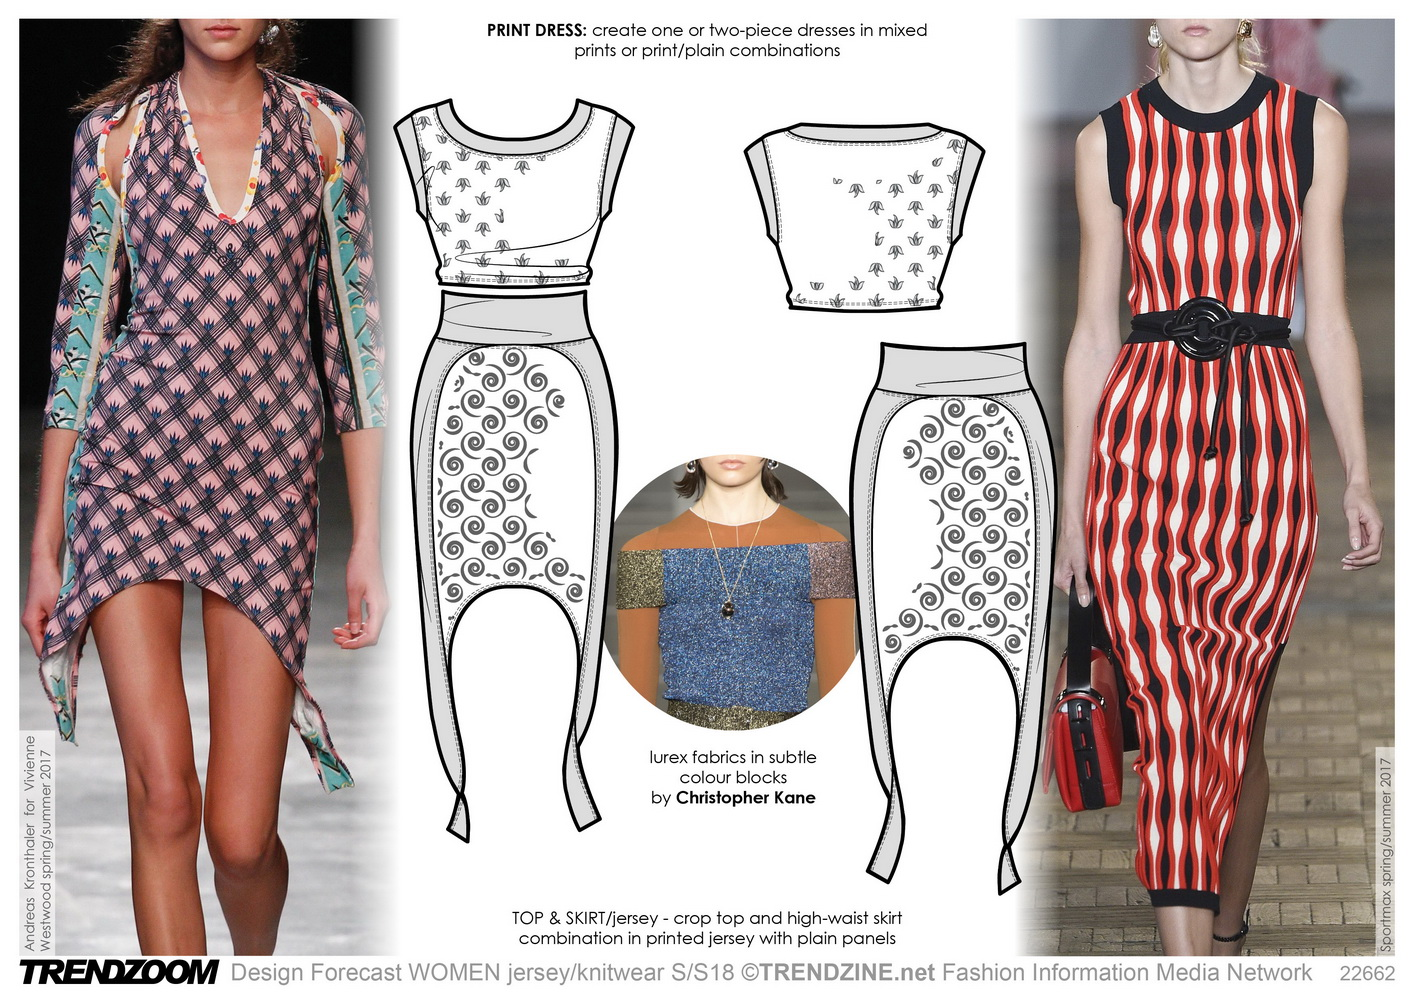 Trendzoom: Design Forecast Women Jersey & Knitwear S/S 18 ...